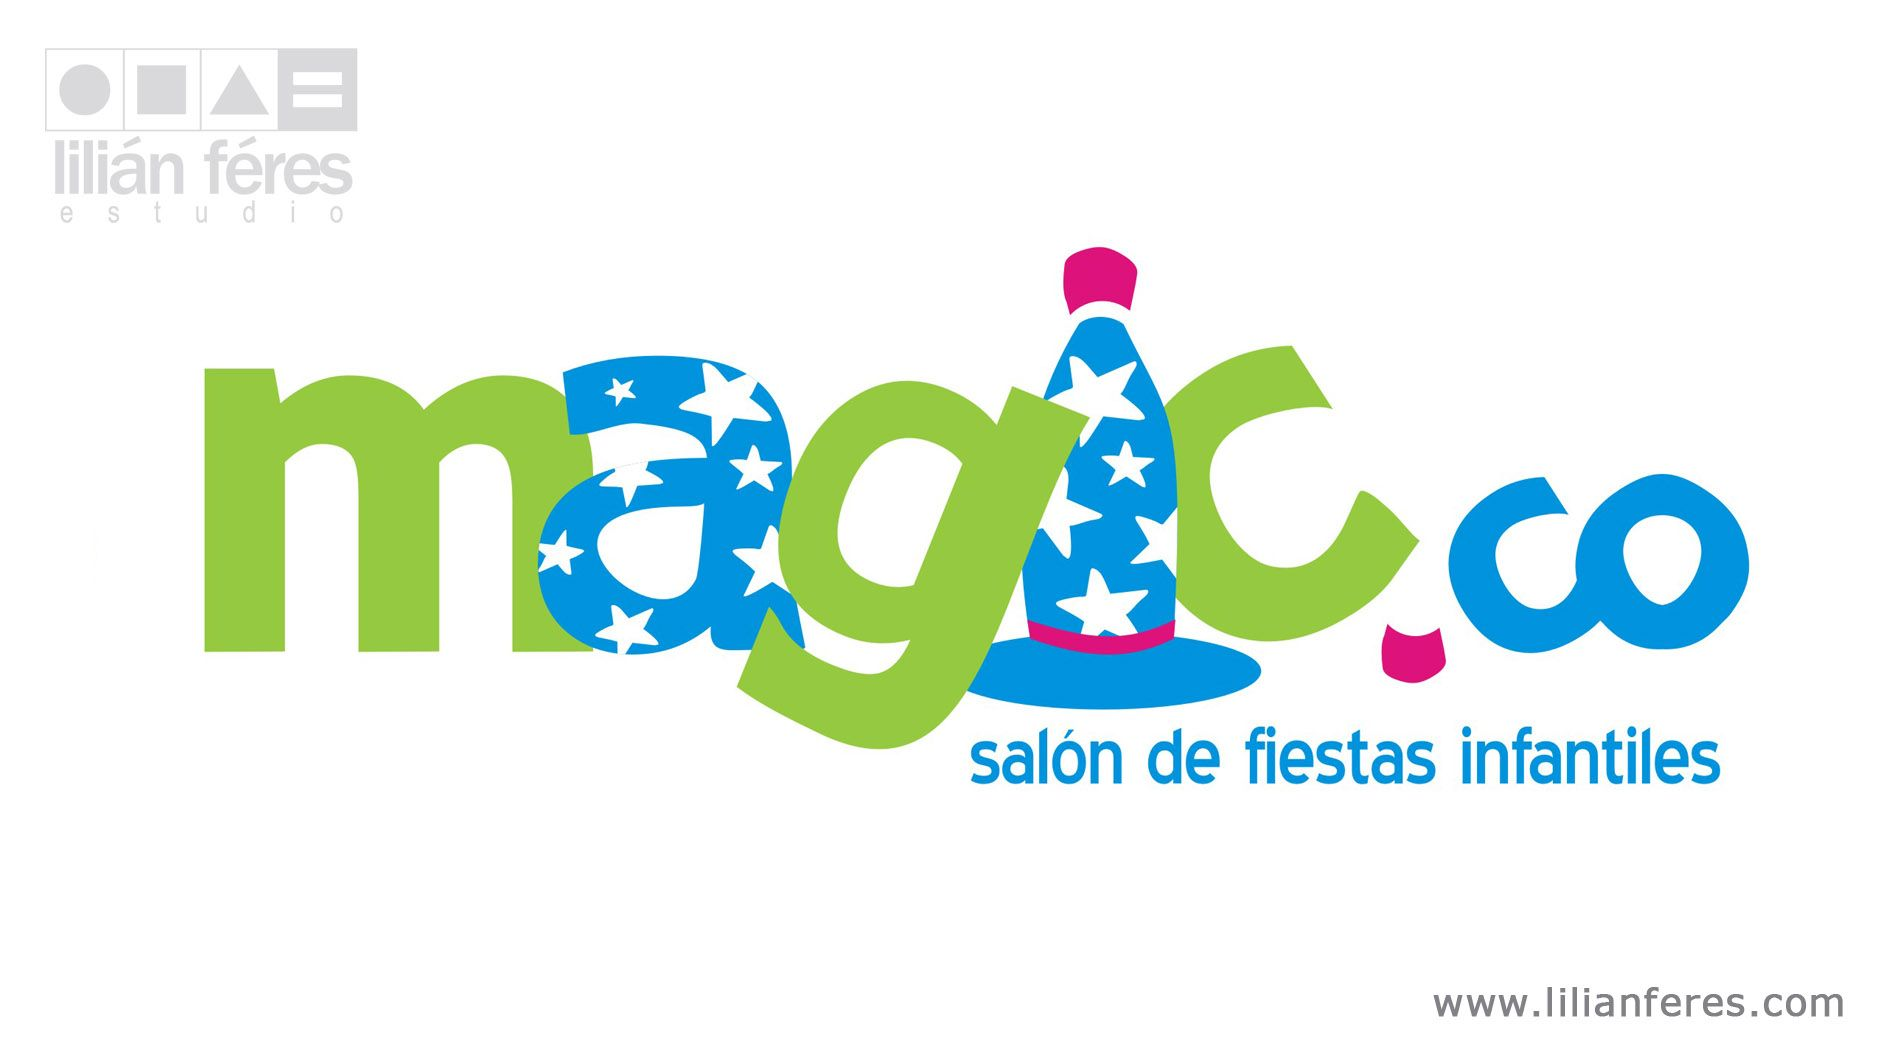 Dise o de logotipo para sal n de fiestas infantiles for Salones de diseno